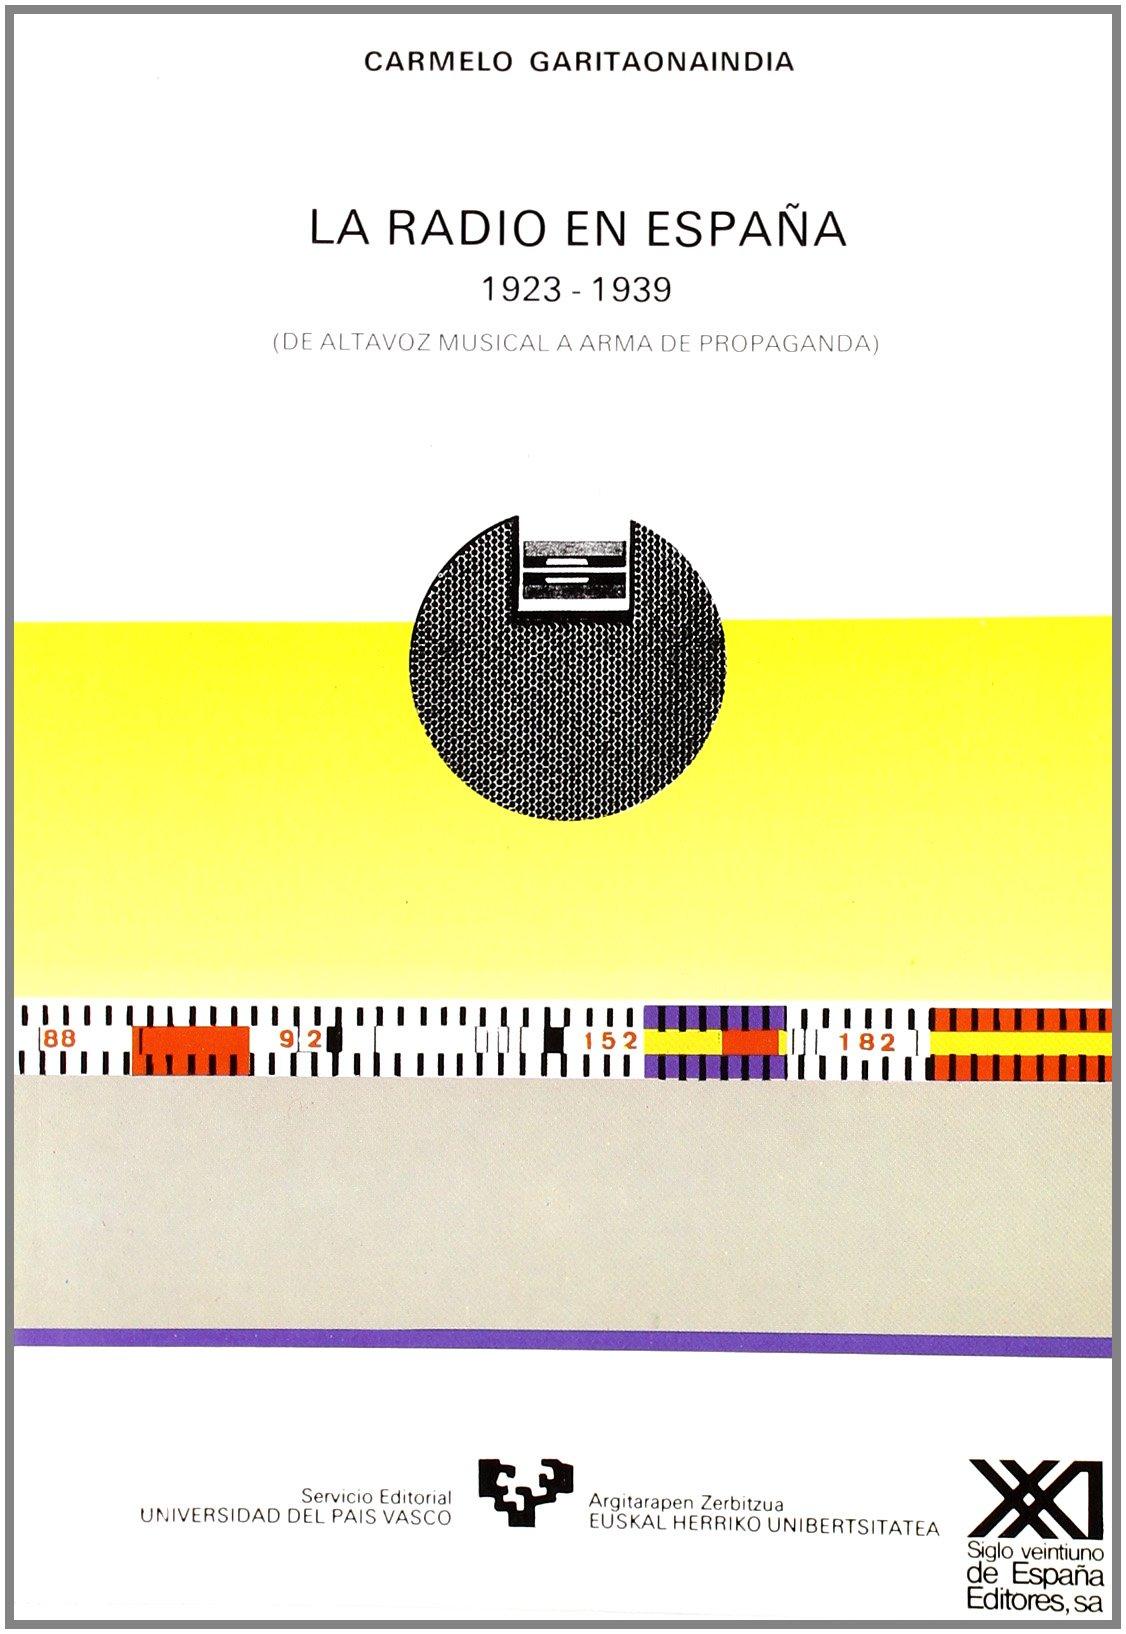 La radio en España 1923-1939 . De altavoz musical a arma de propaganda Zabalduz: Amazon.es: Garitaonandia, Carmelo: Libros